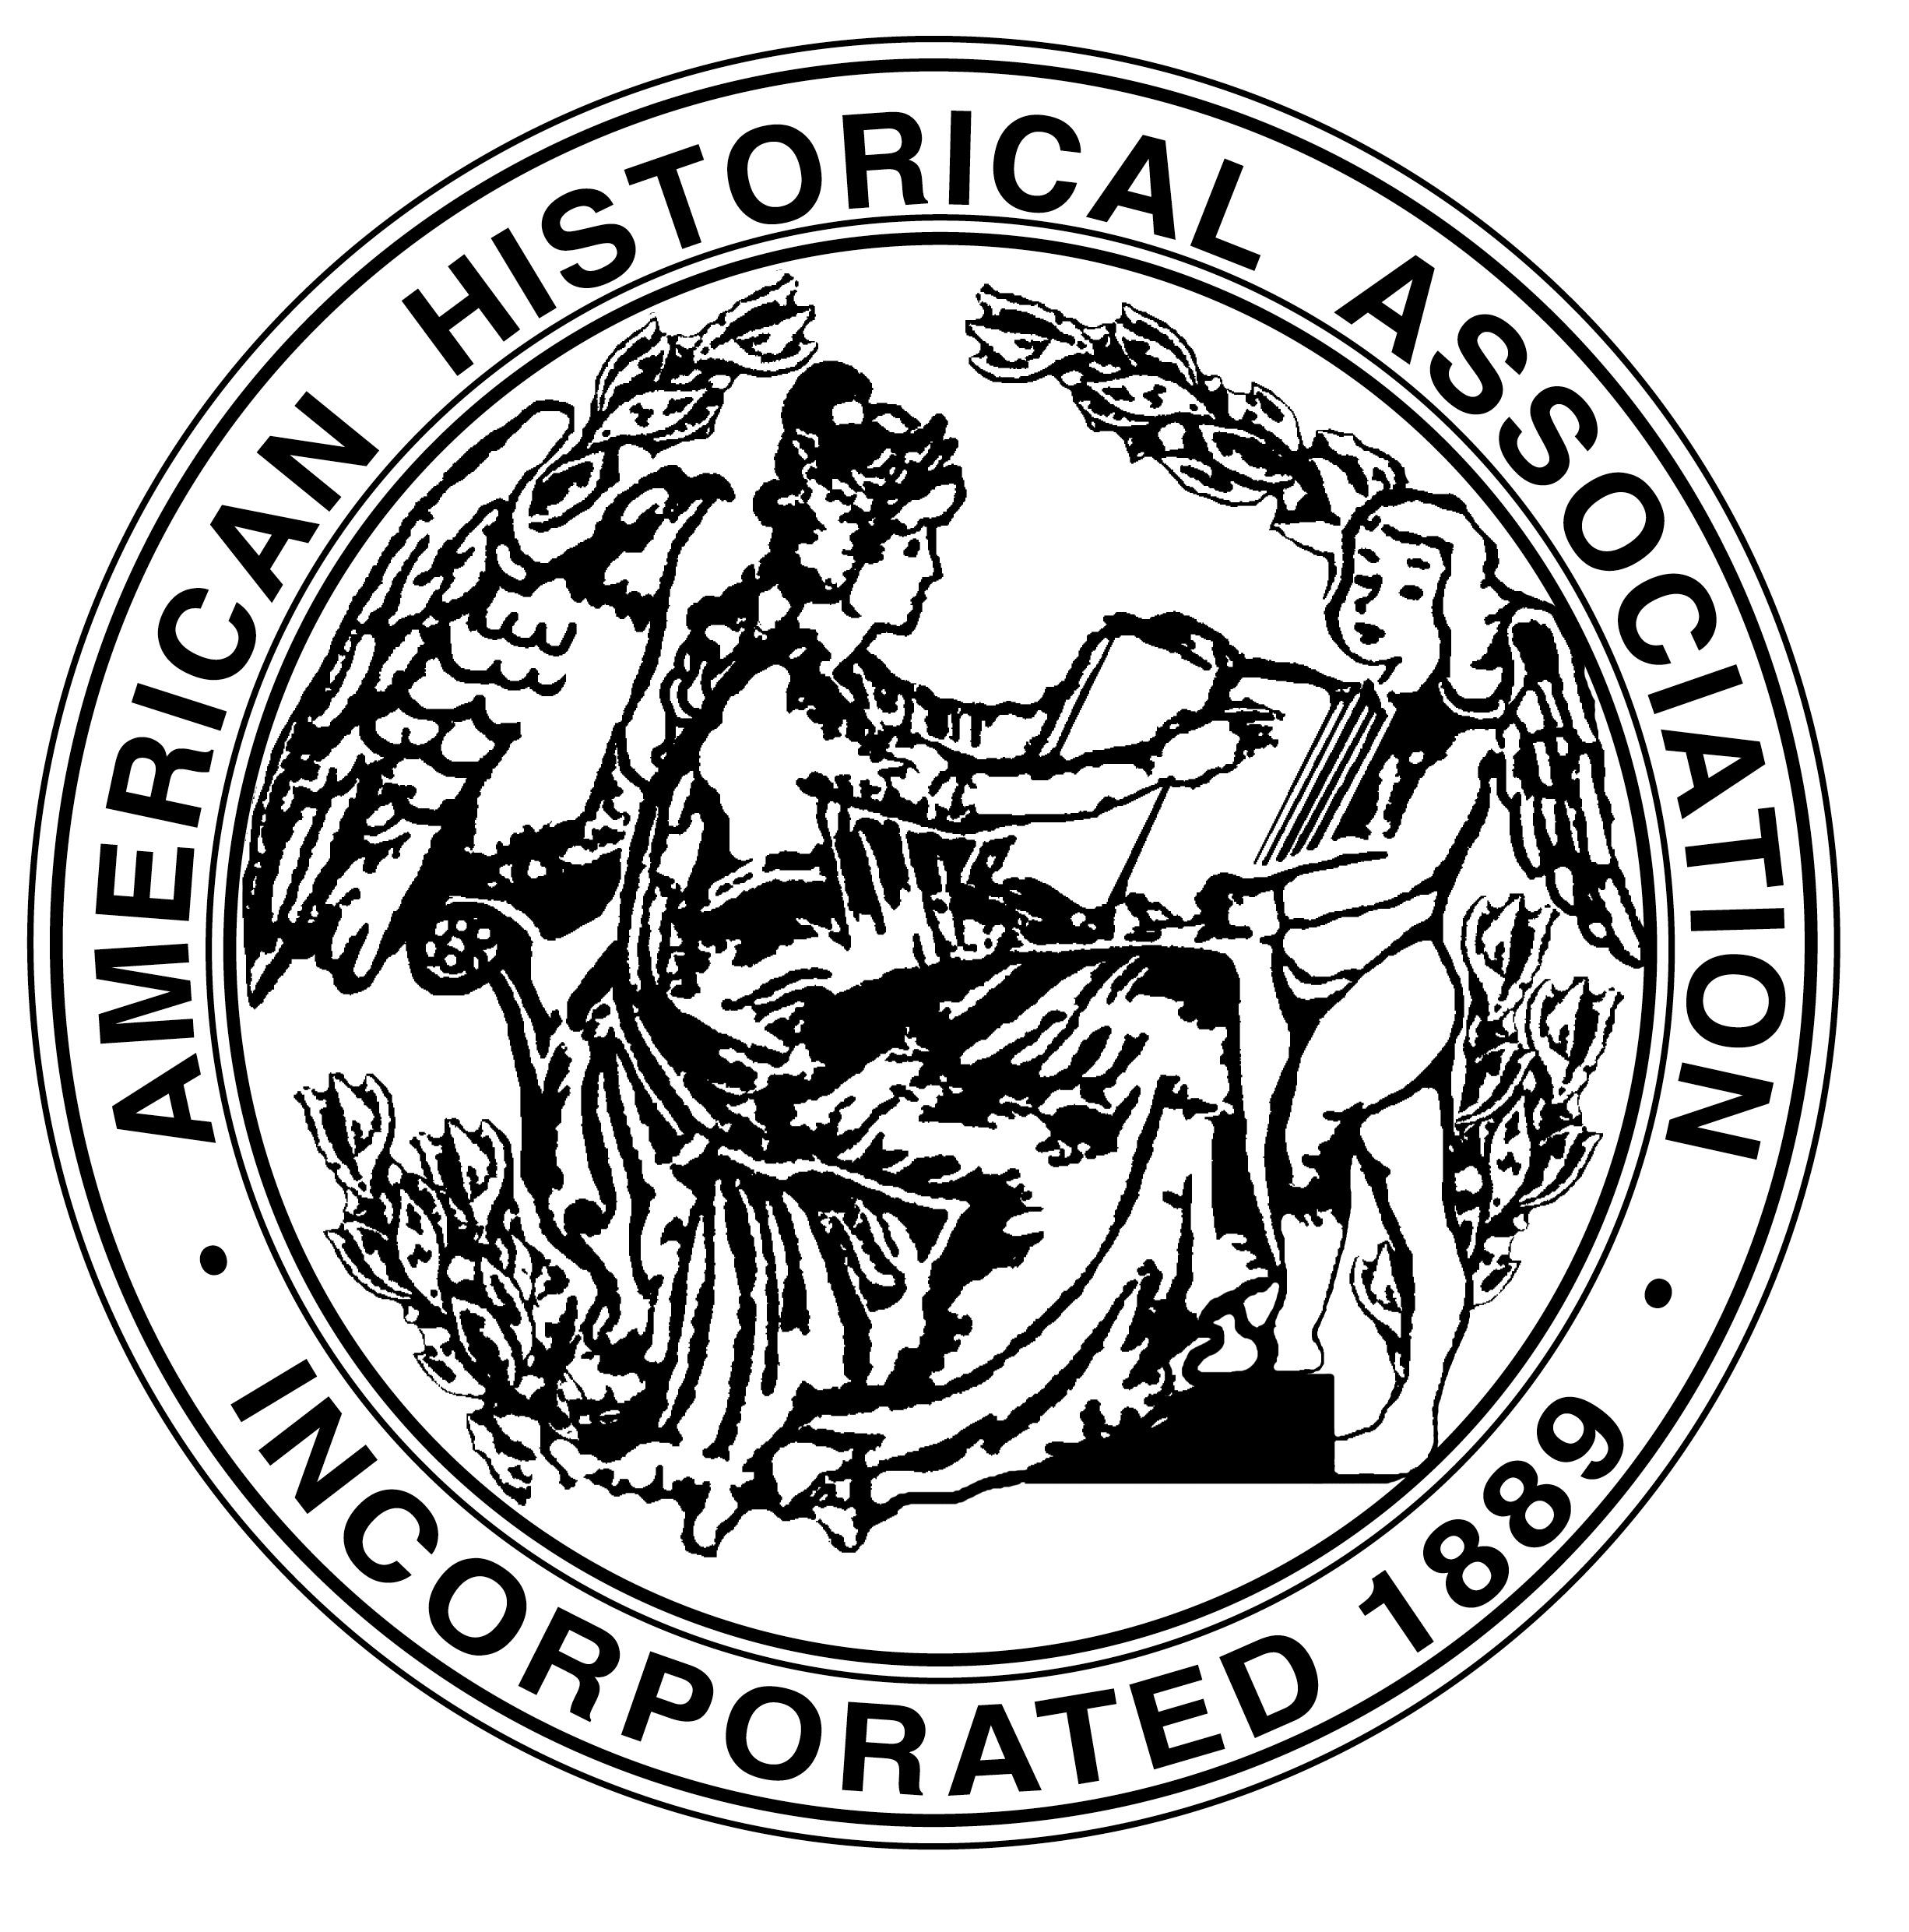 Mary Beth Norton &James Grossman - President & Executive Directorof the American Historical Association